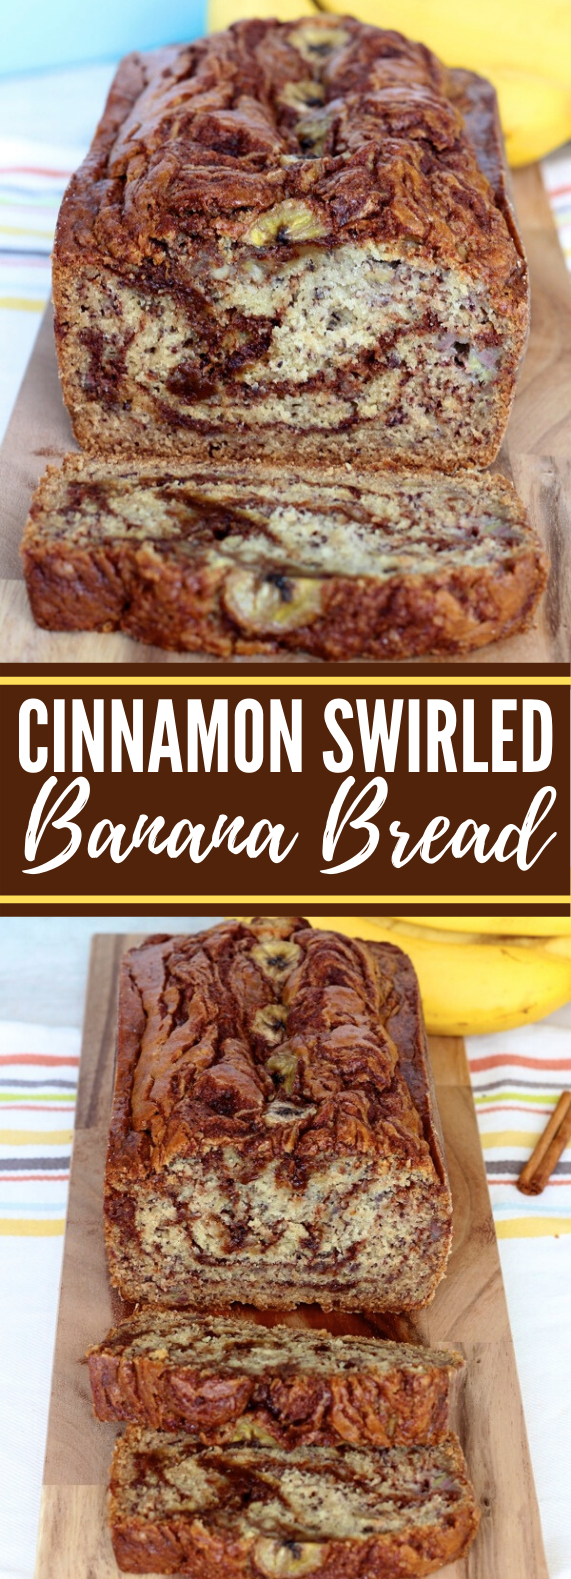 CINNAMON SWIRLED BANANA BREAD #desserts #breakfast